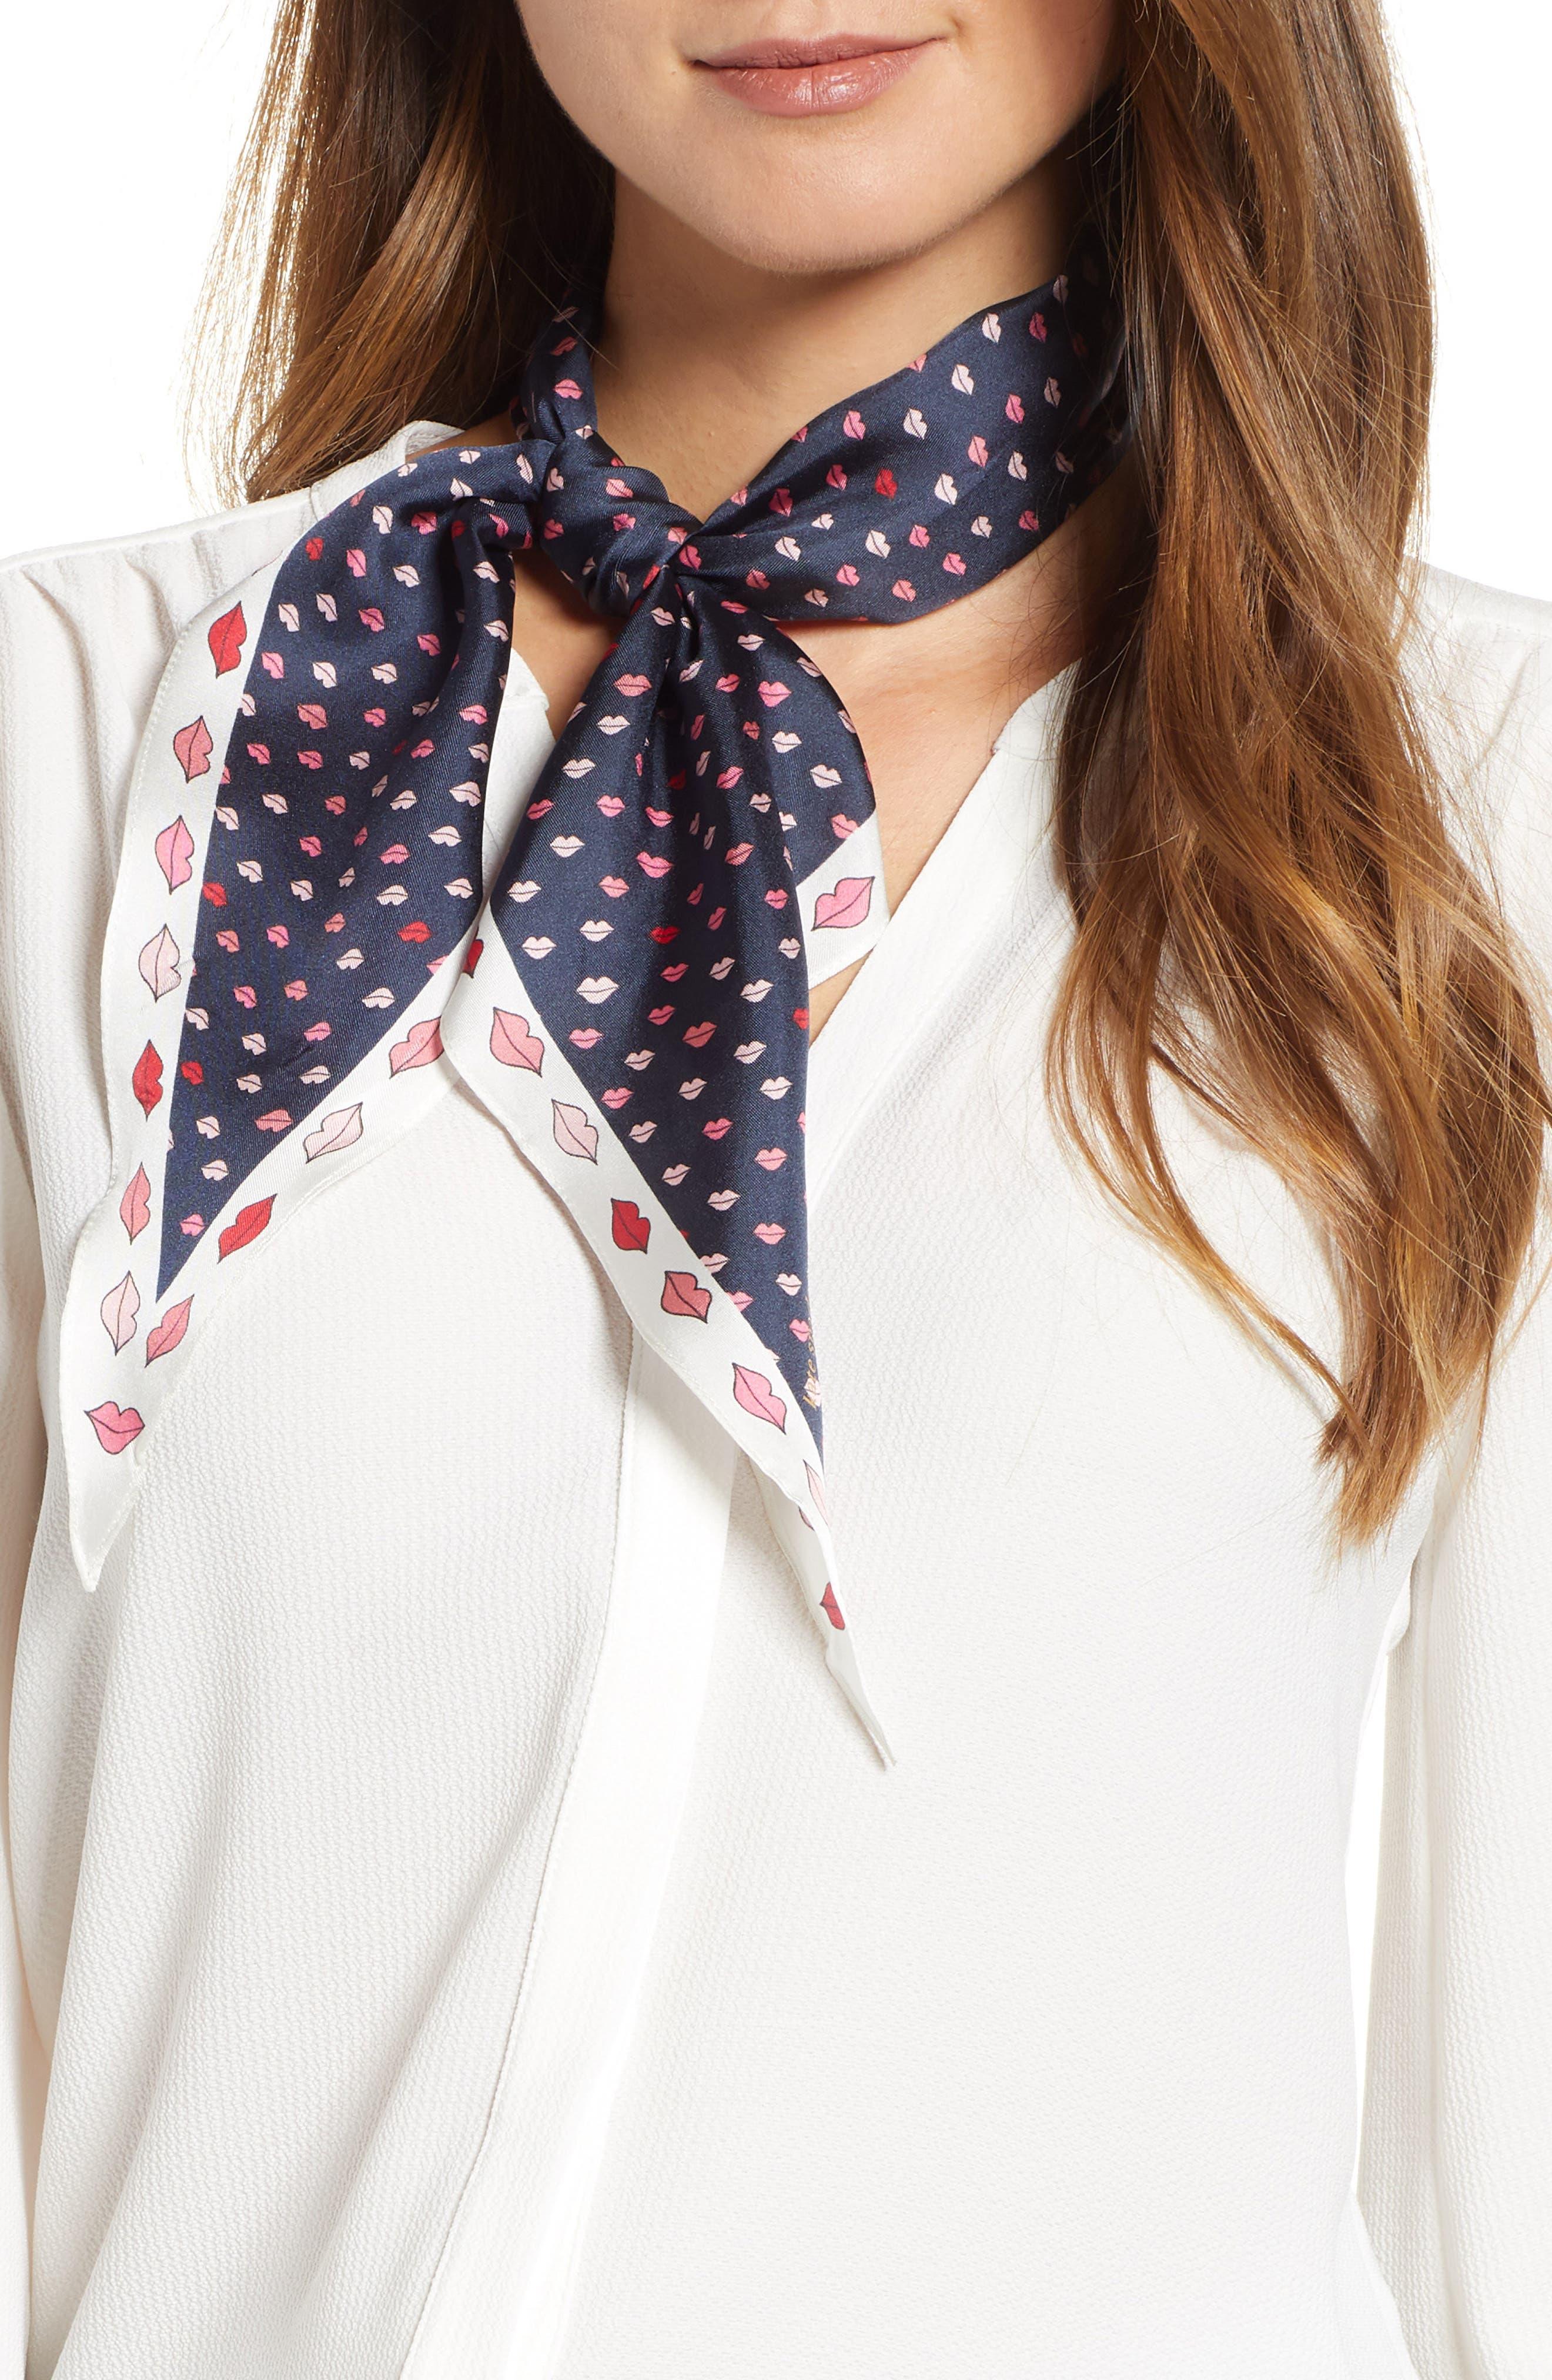 KATE SPADE NEW YORK,                             lips diamond silk scarf,                             Main thumbnail 1, color,                             PARISIAN NAVY